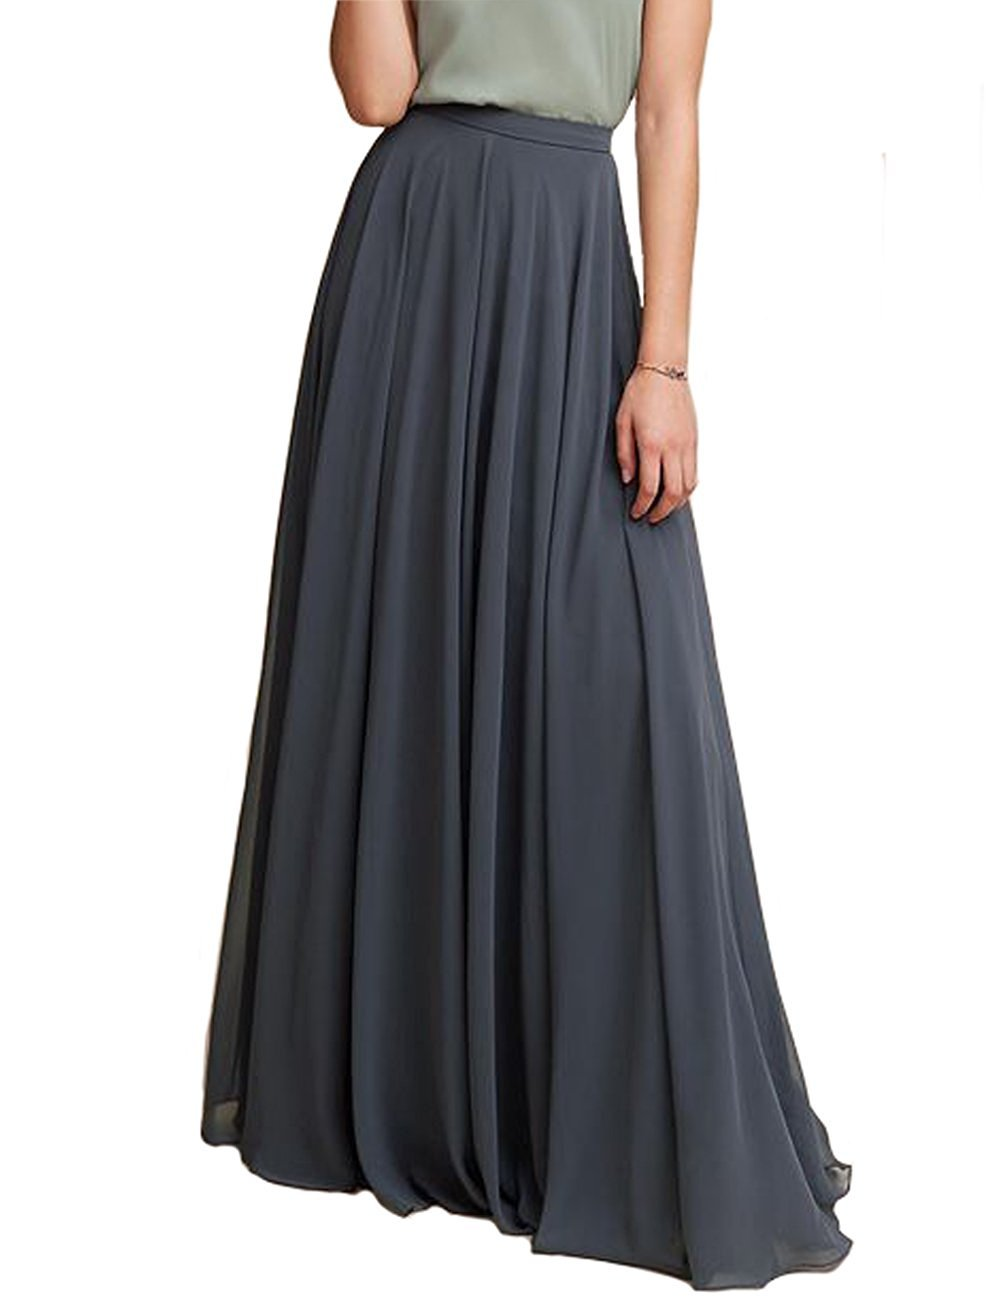 Omelas Women Long Floor Length Chiffon High Waist Skirt Maxi Bridesmaid Pary Dress (White, XXXL) by Omelas